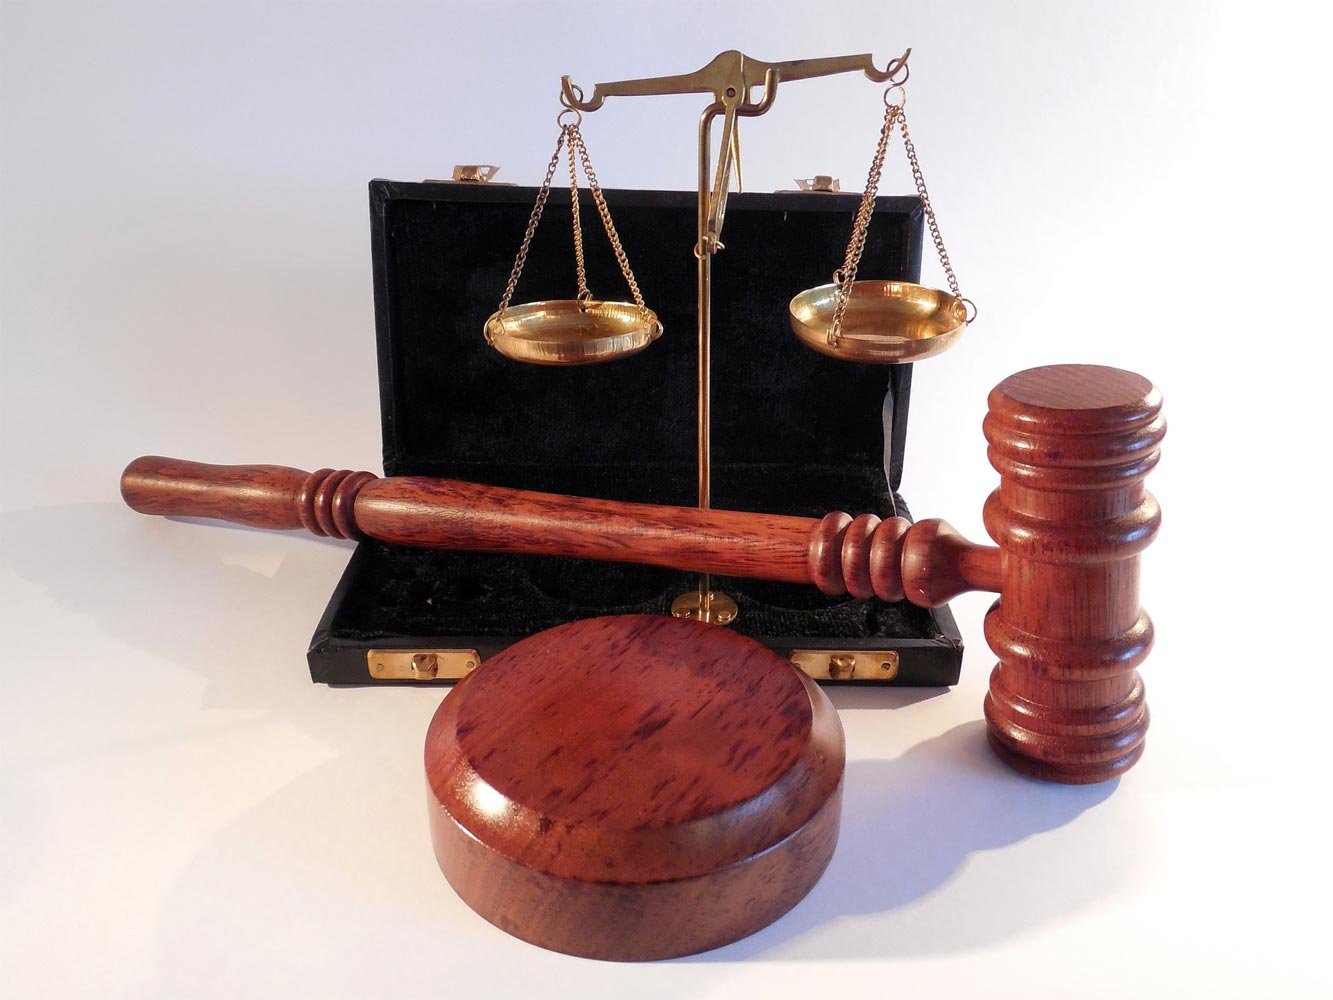 Justizia, Hammer, Waage